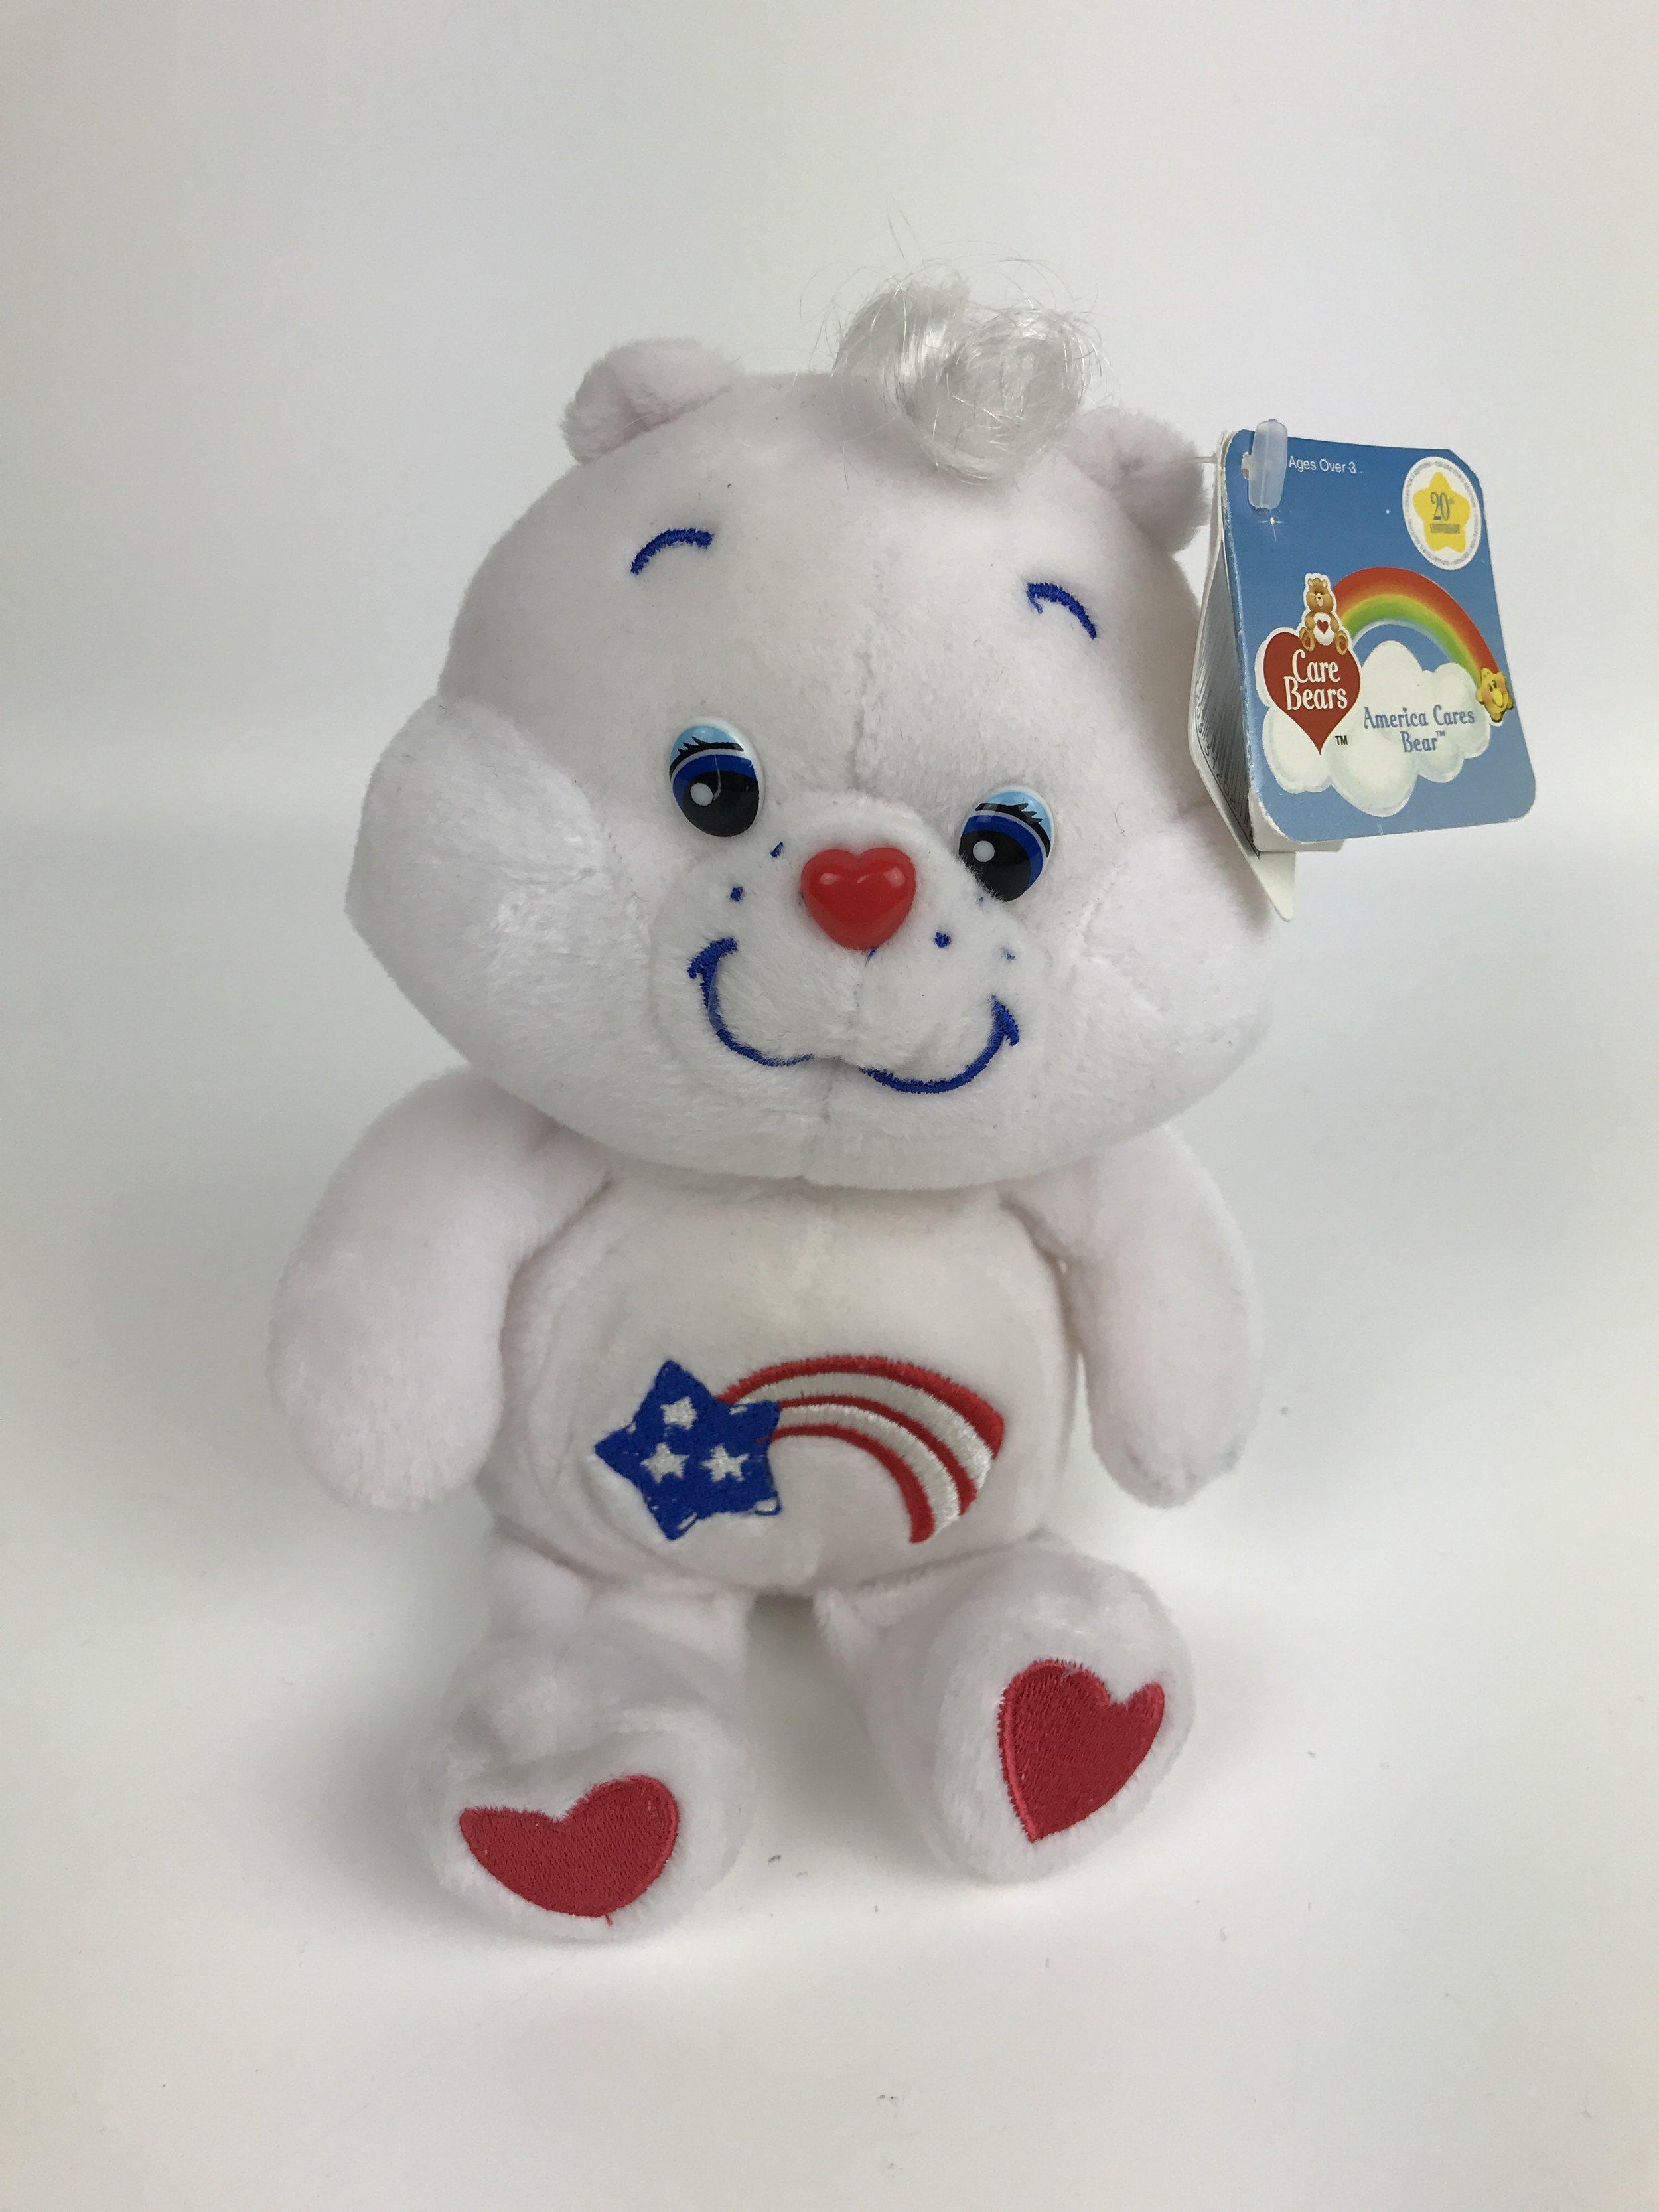 America Care Bear plush